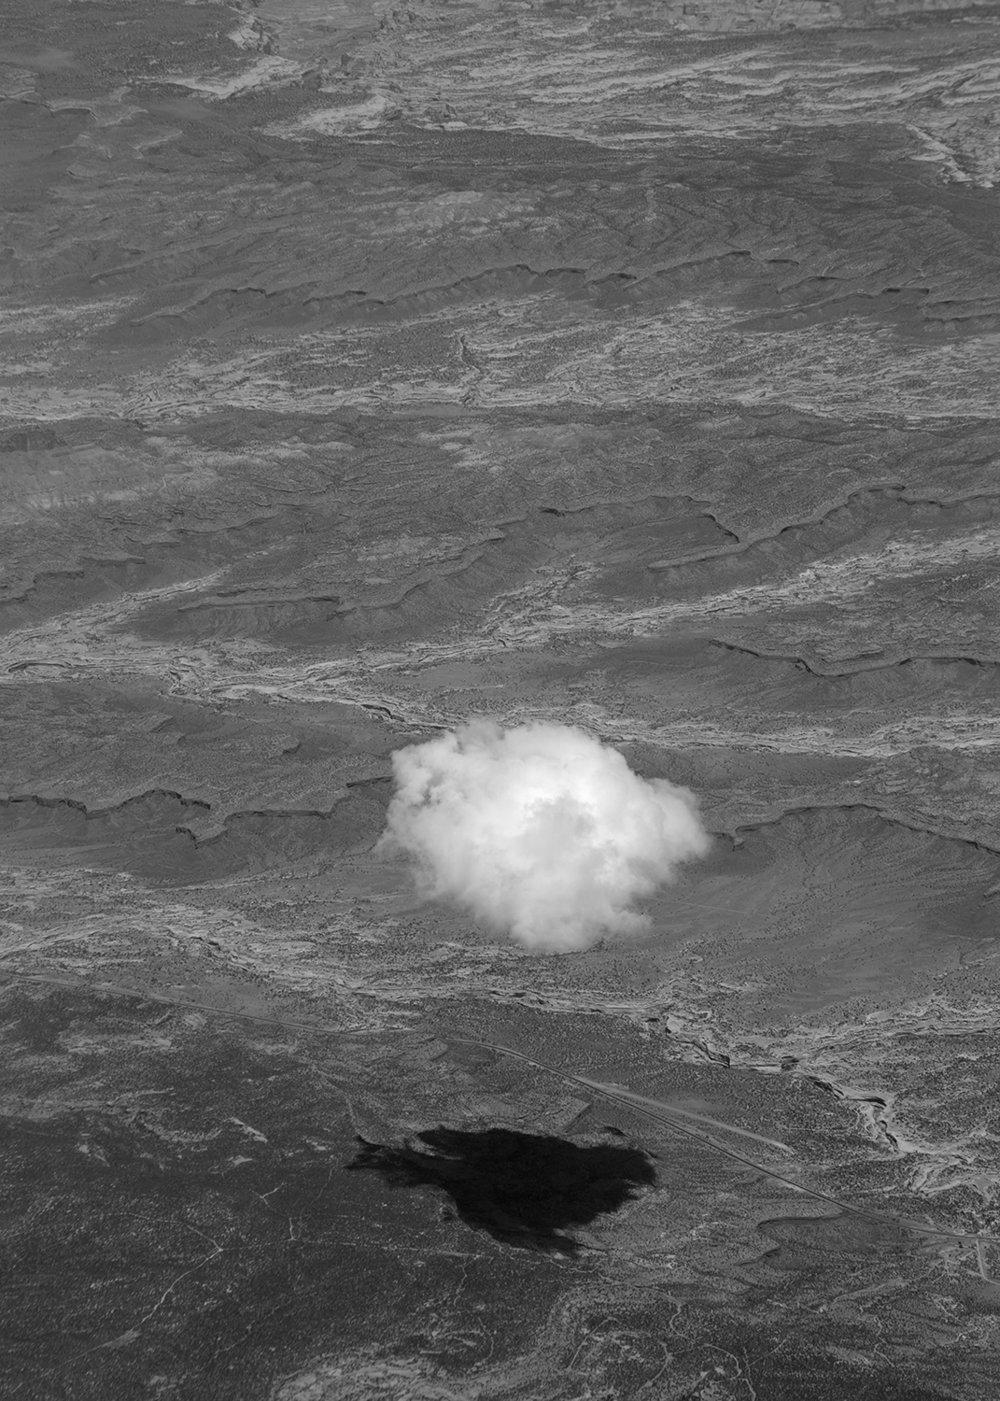 Cloud, Fry Canyon